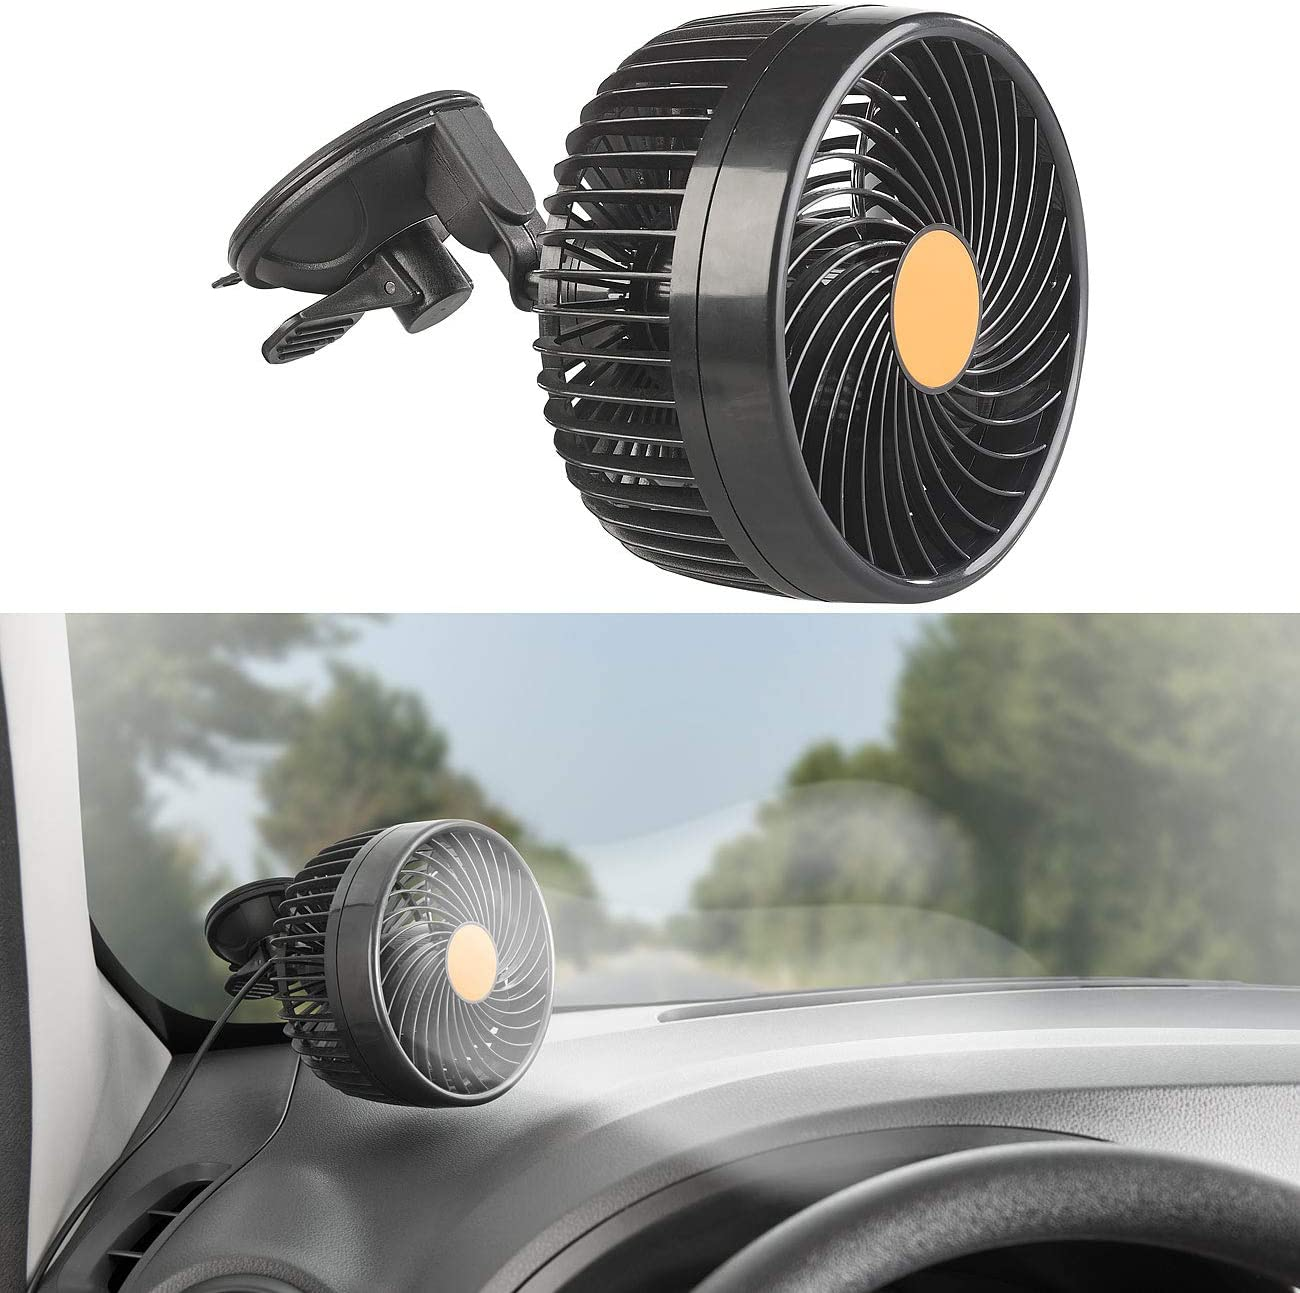 Lescars Ventilator 24 Volt: LKW- /& Kfz-Ventilator f LKW-Ventilator 24V stufenlose Geschwindigkeit 24-V-Anschl 12W